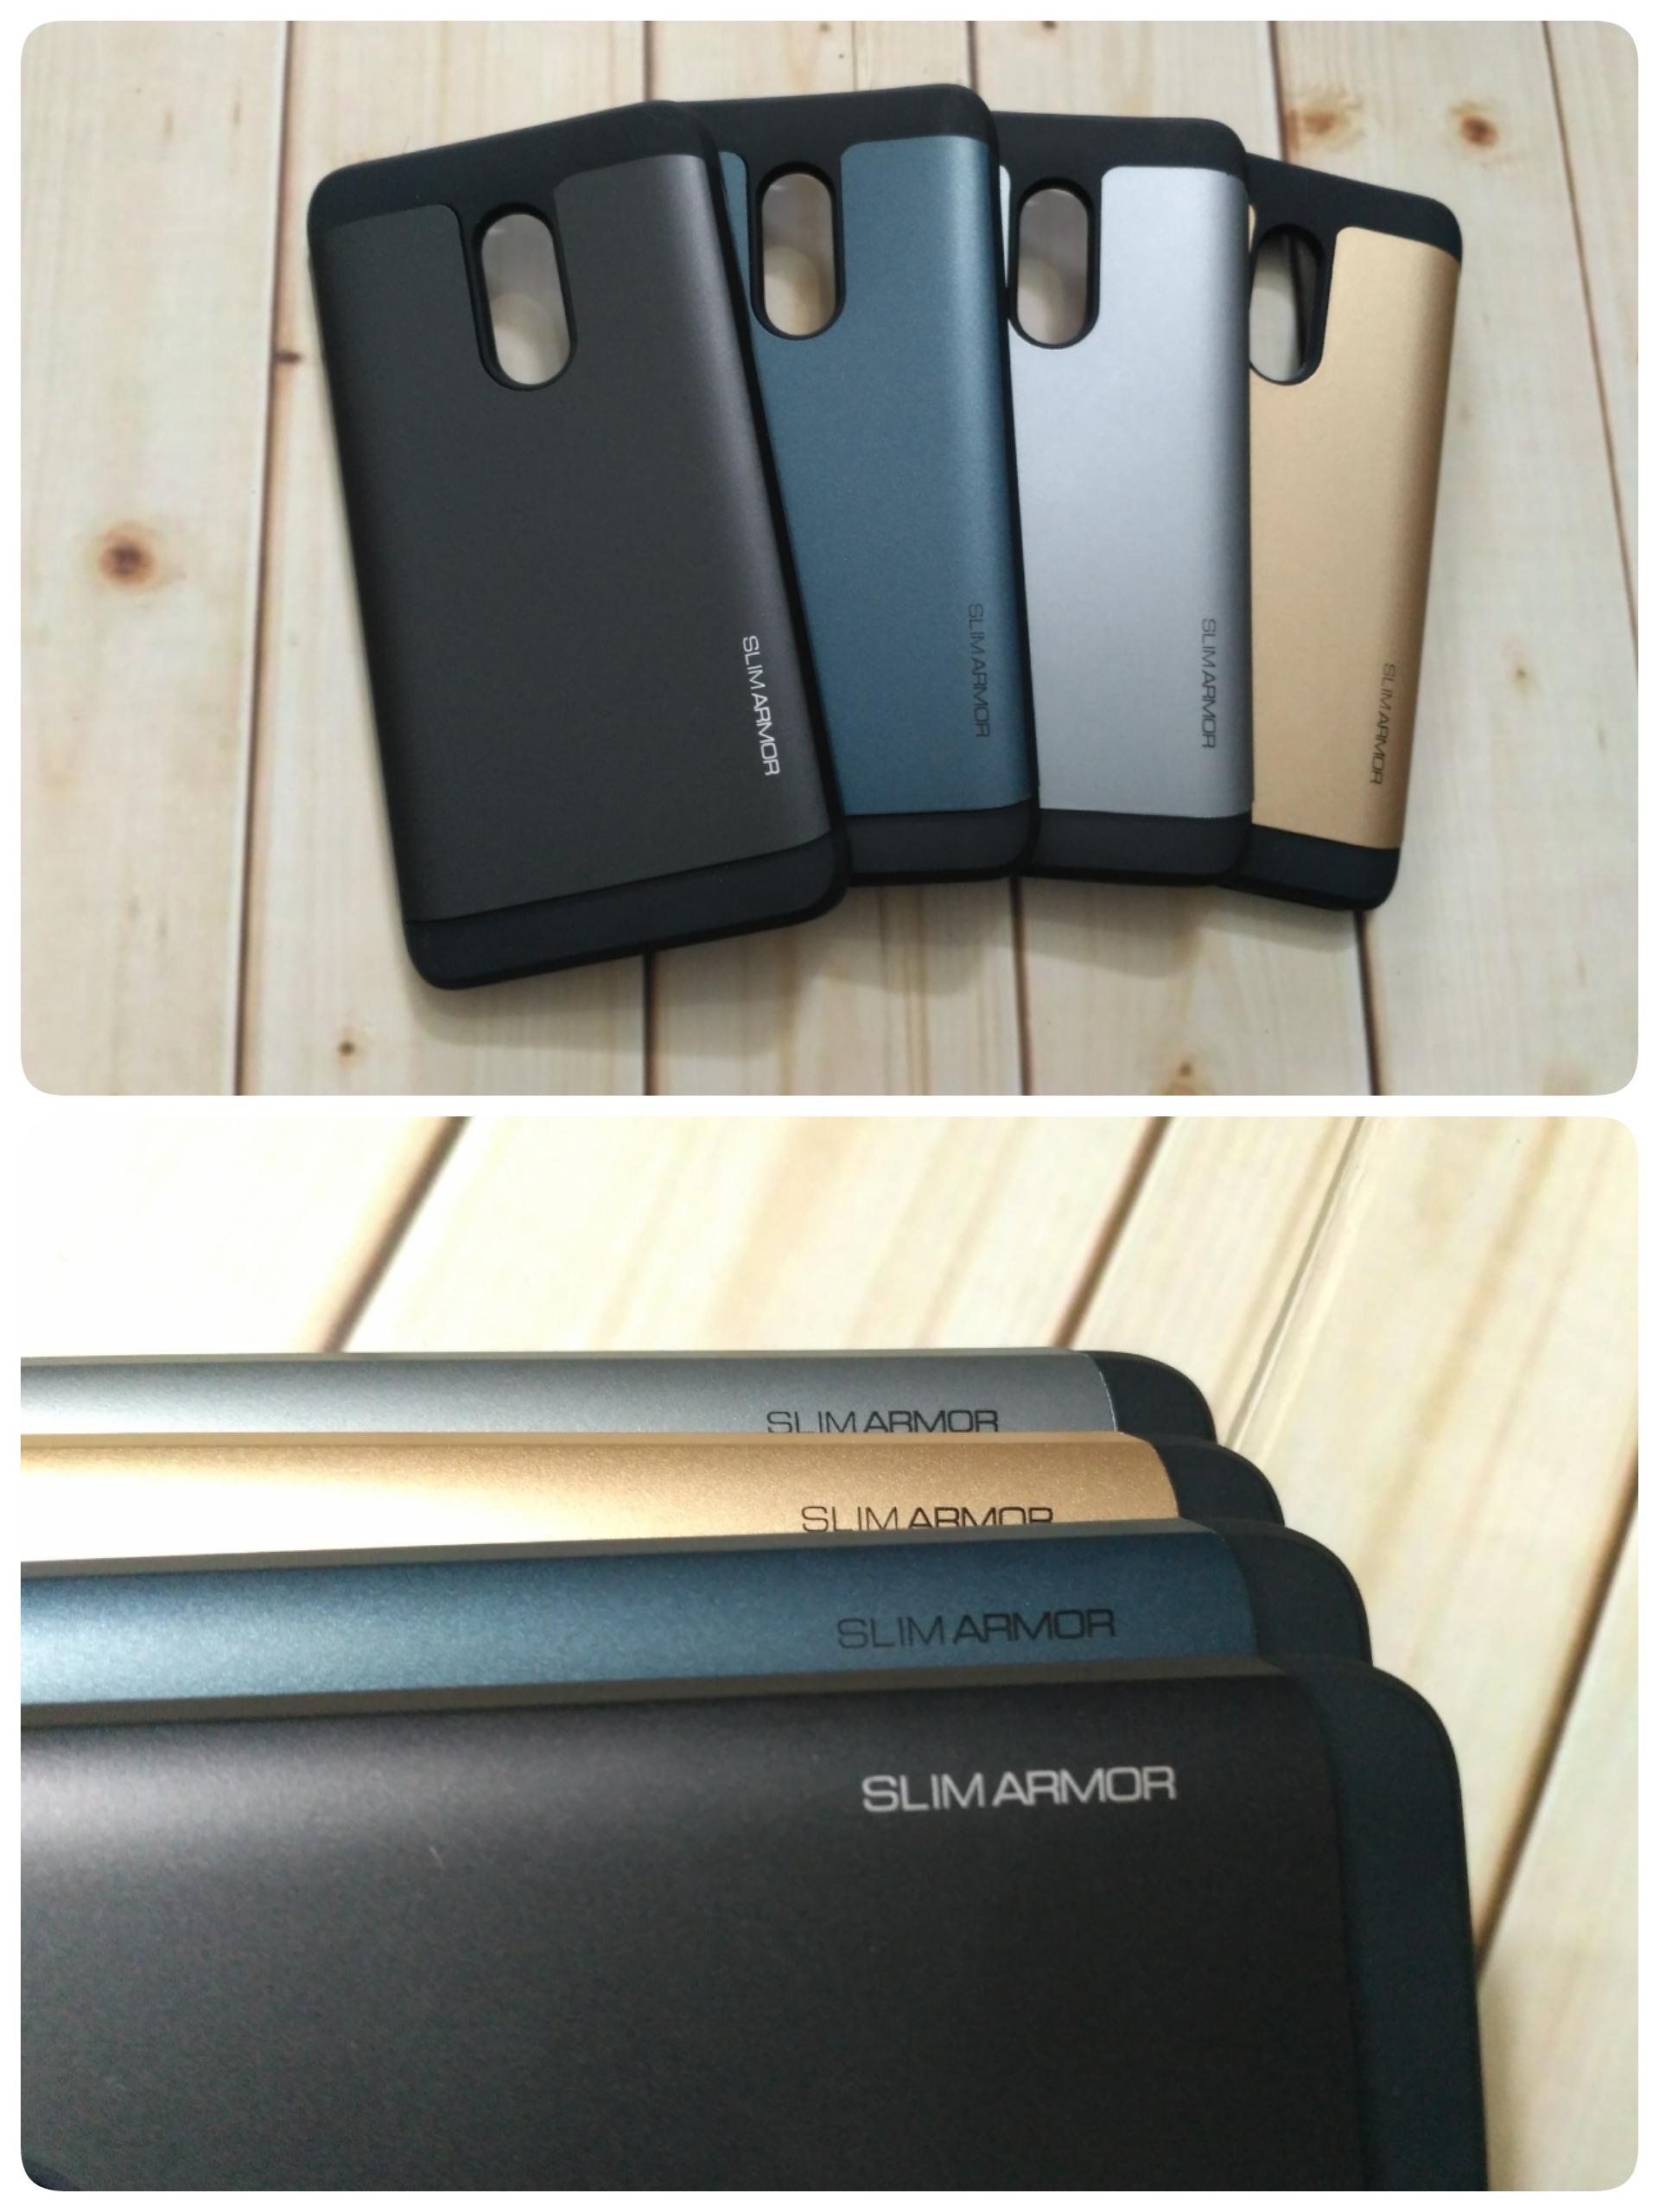 new products 980fc f67c3 Jual Spigen Slim Armor Xiaomi Redmi Note 4 (Tough/Hard Case ...